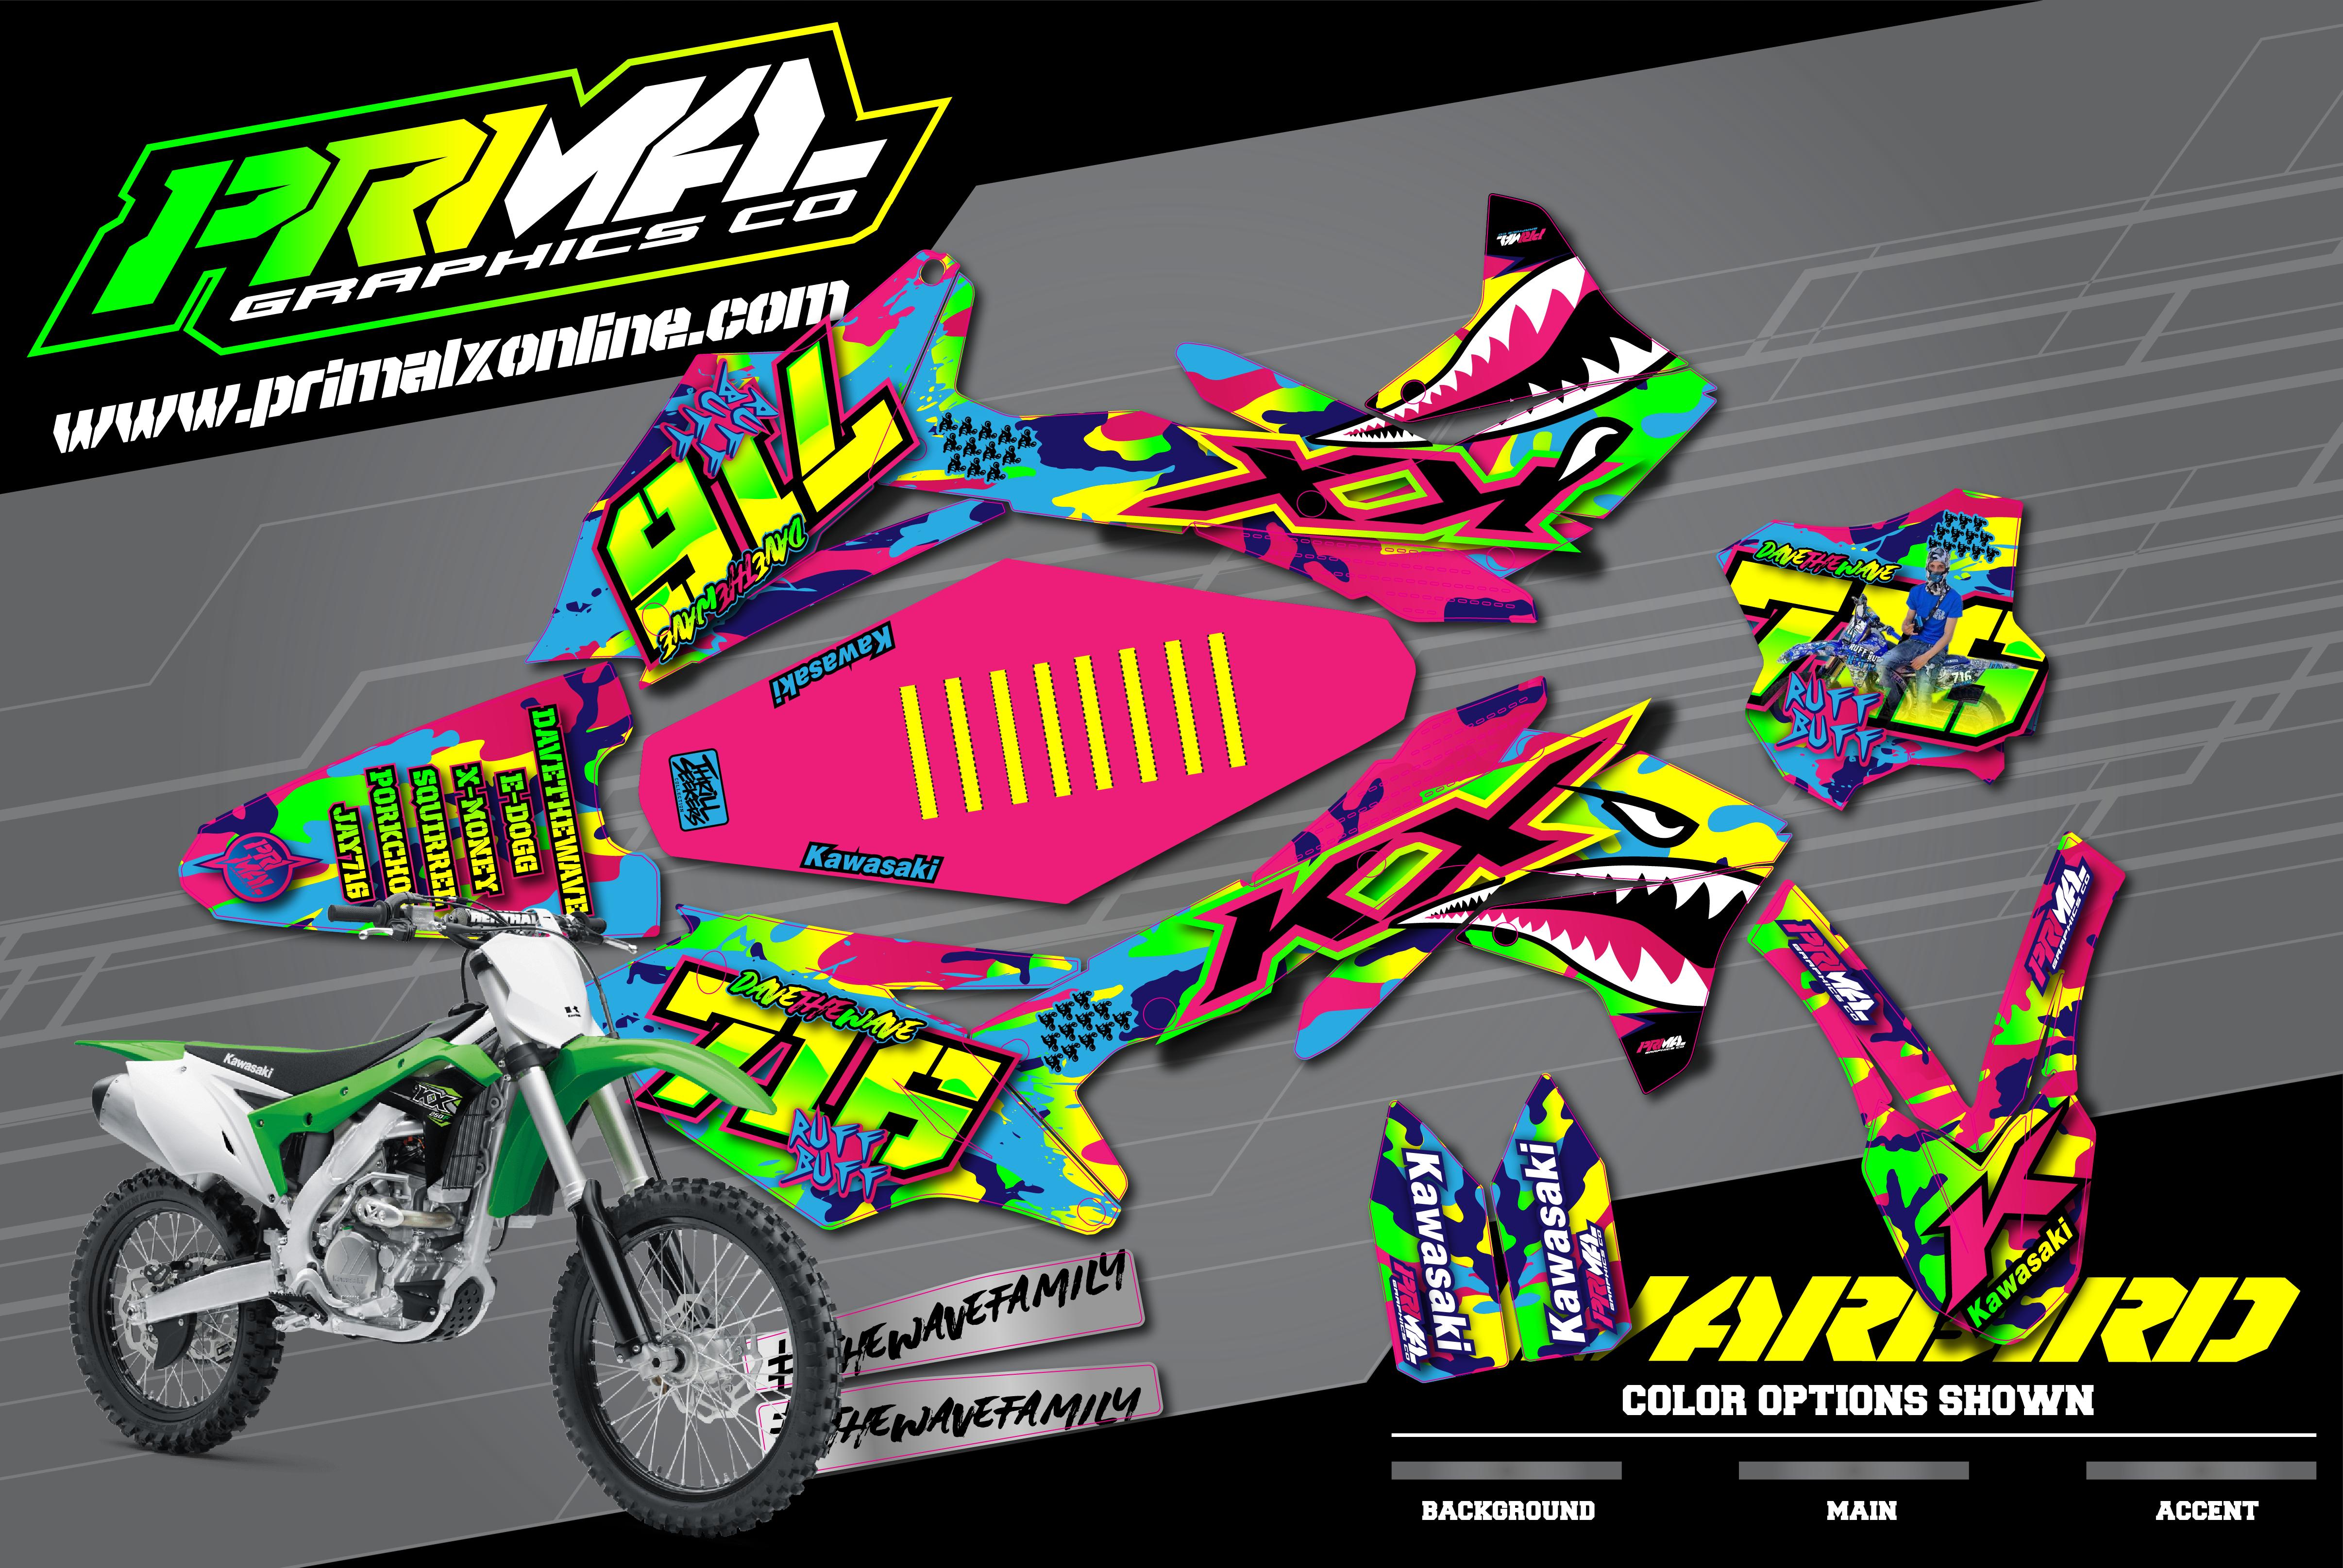 PRIMAL-X-MOTORSPORTS-PRIMAL-GRAPHICS-CO-KAWASAKI-KX450F-KX250F-SERIES-MOTOCROSS-GRAPHICS-DAVE-THE-WAVE-01